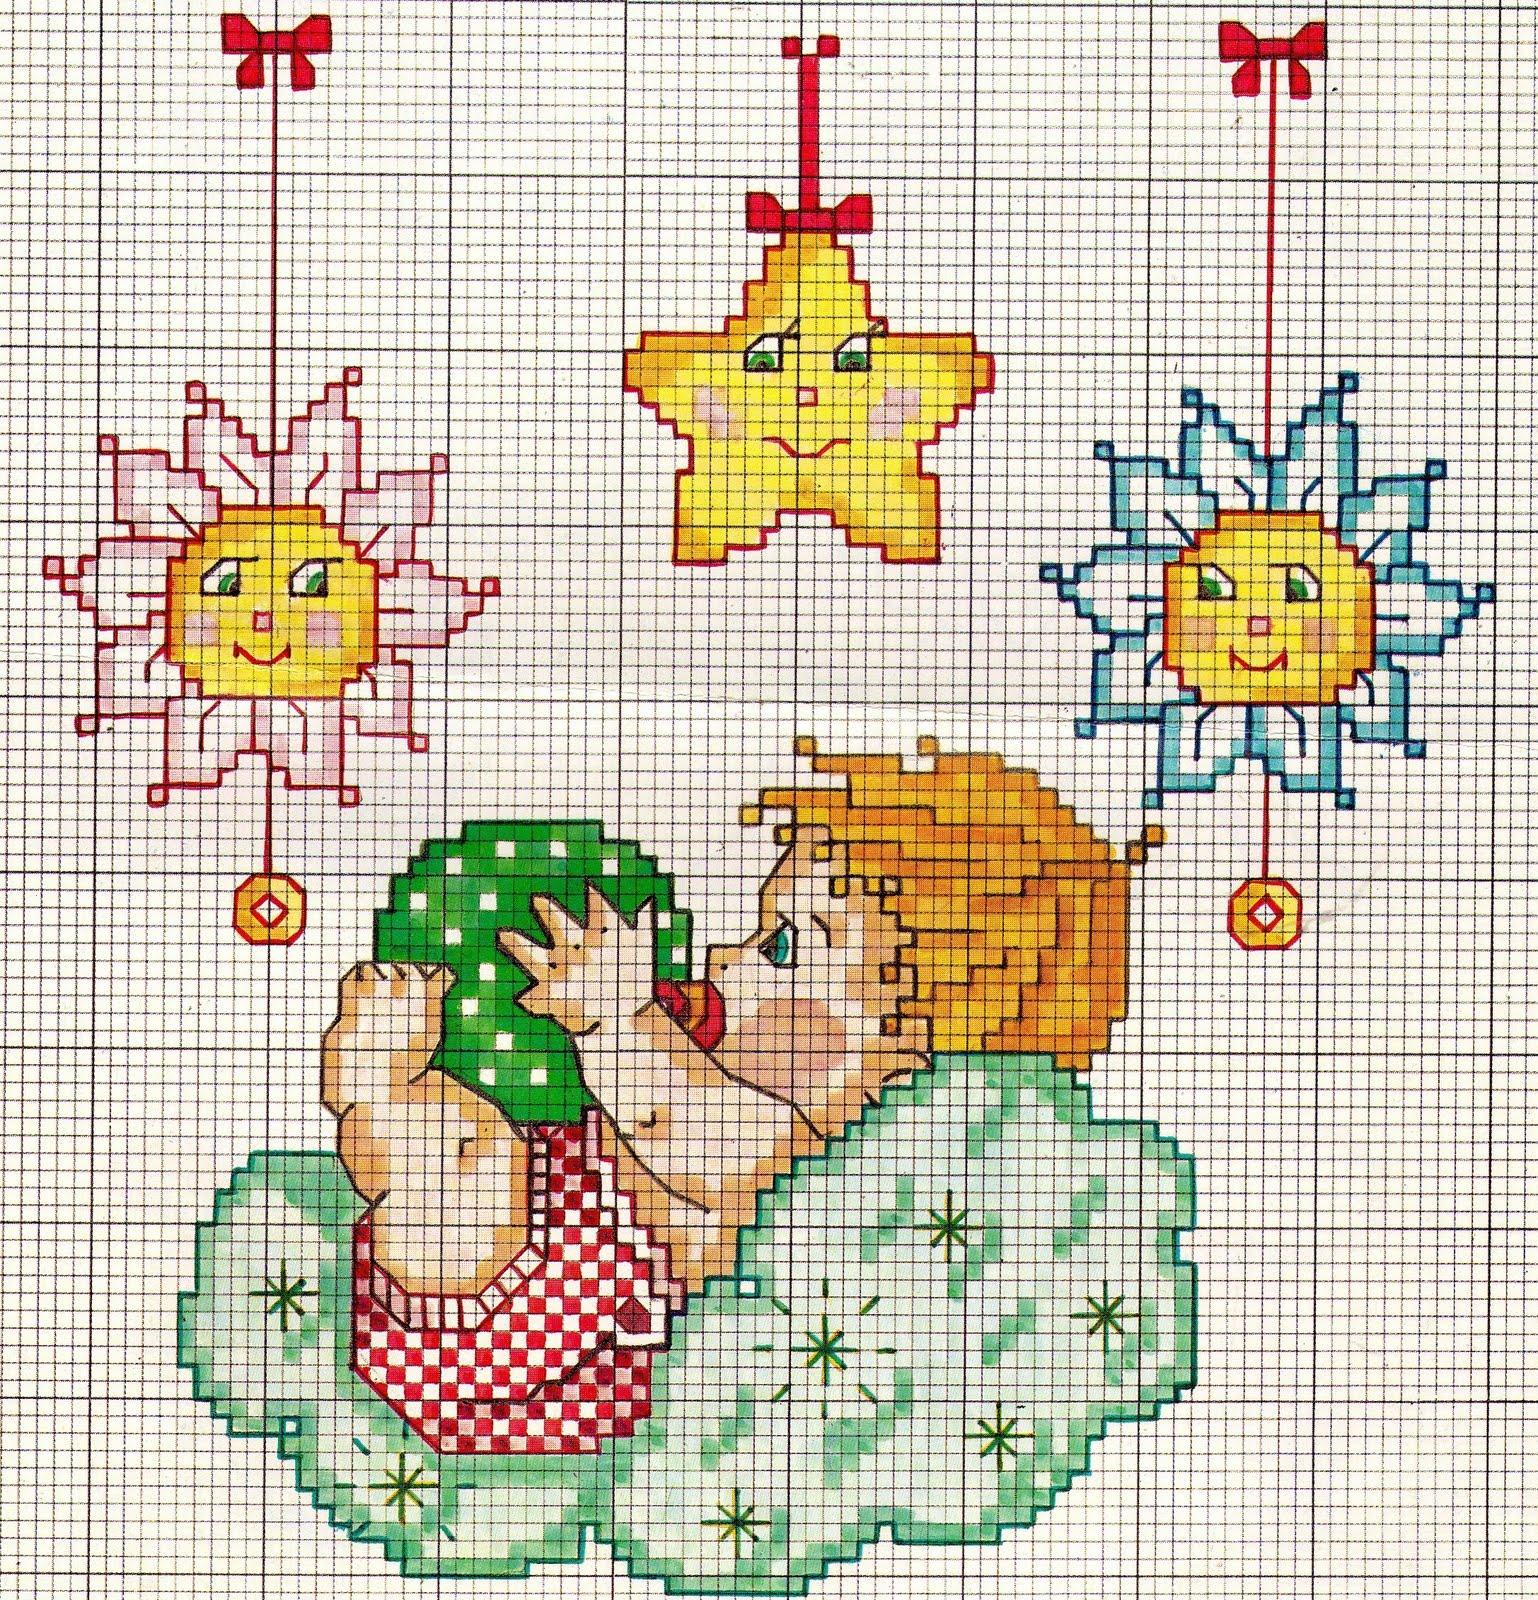 Connu ♥ღ UN LAGO DI IDEE XXX ღ♥: Bimbi che dormono: punto croce!!! PA36